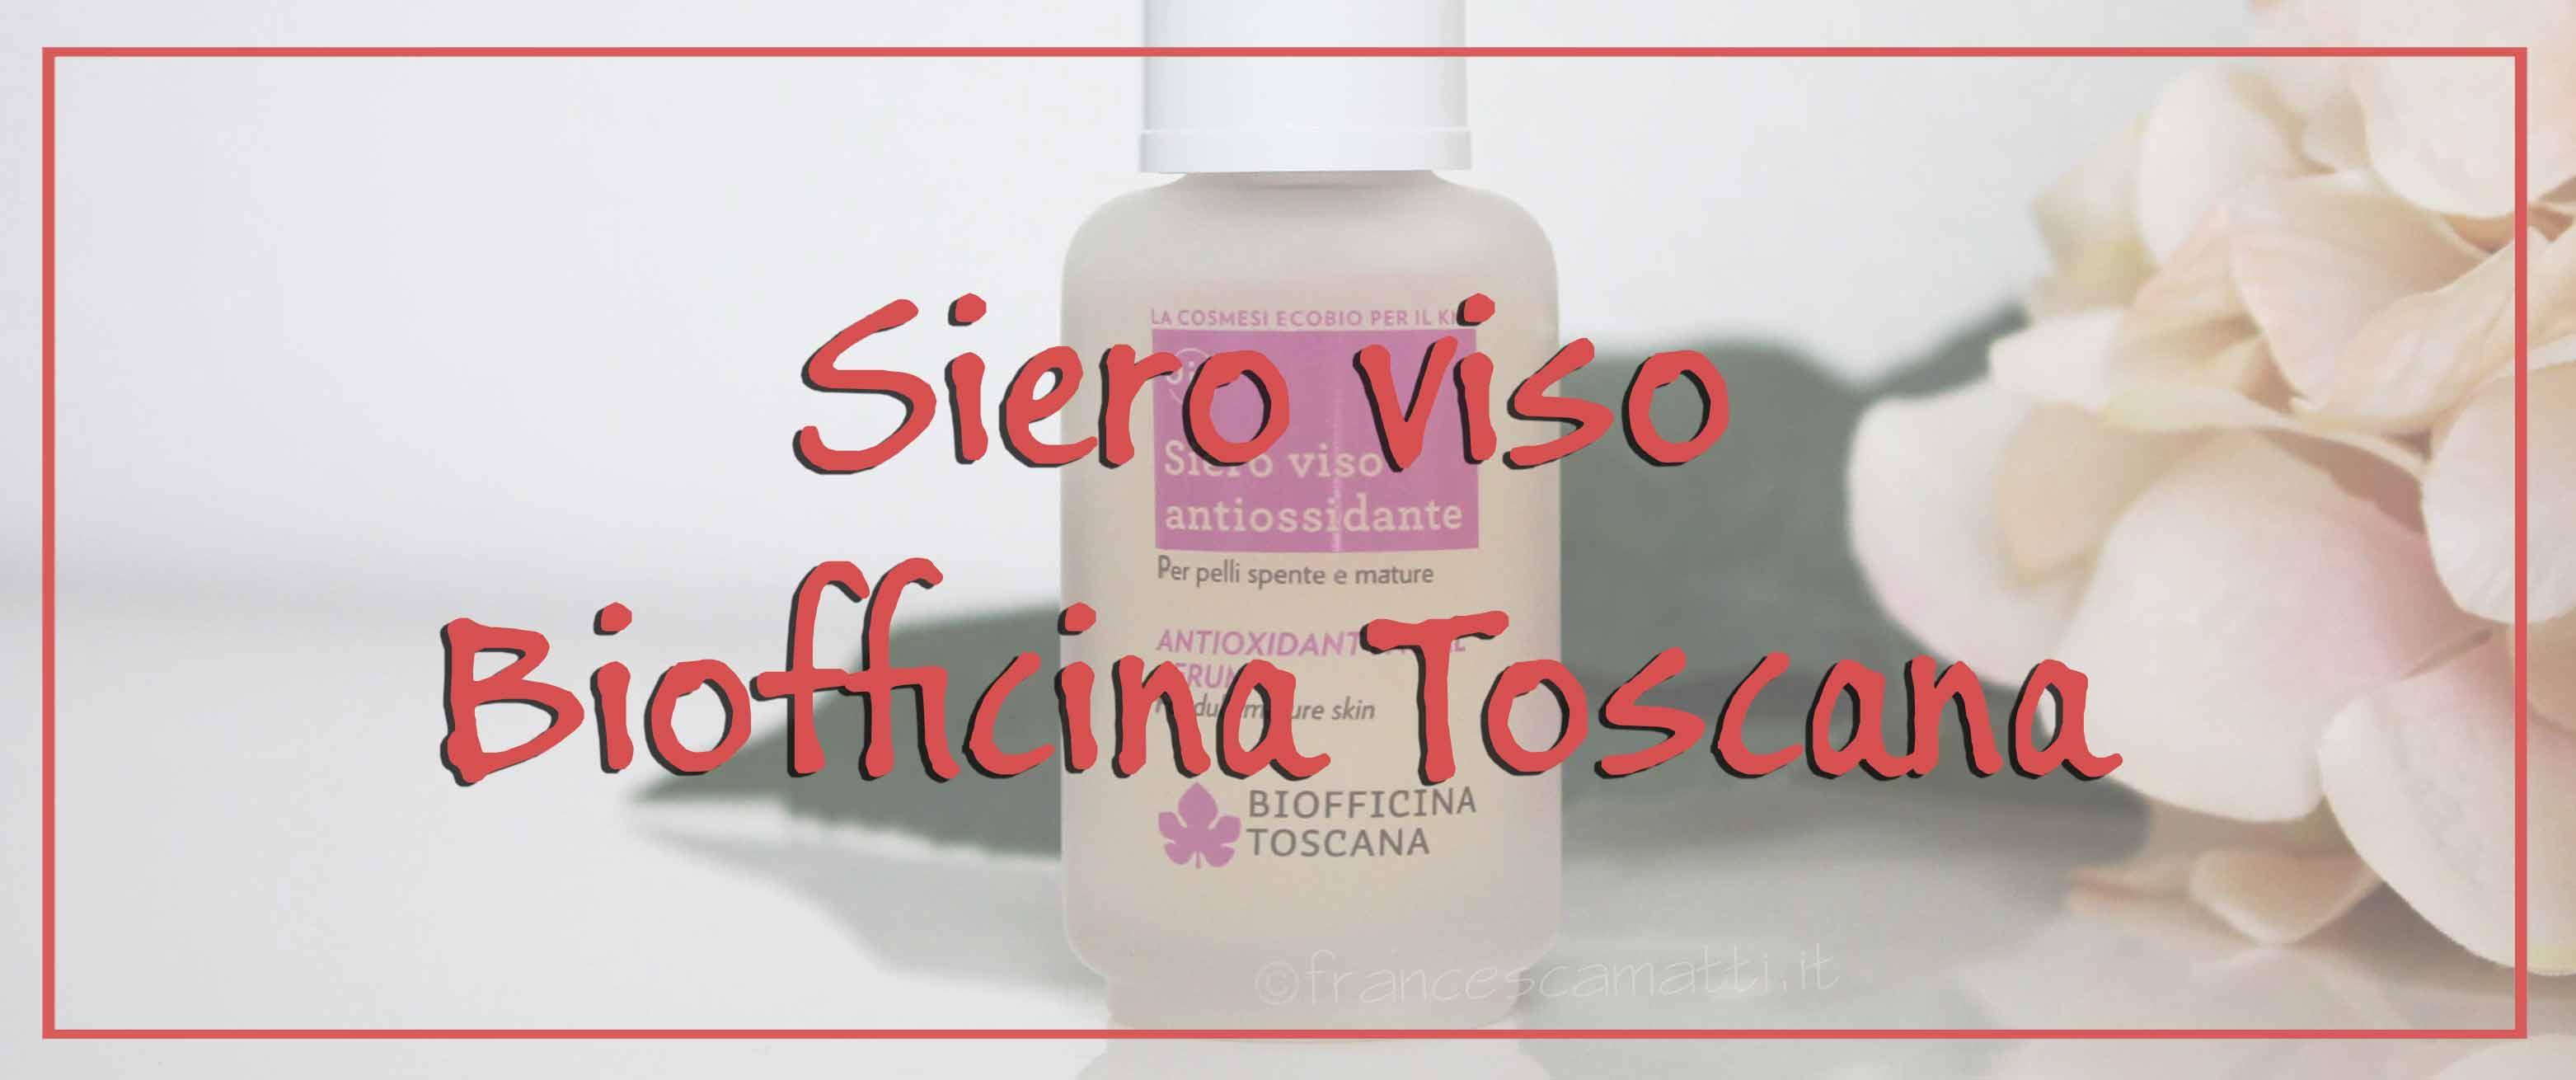 Siero Viso Antiossidante Biofficina Toscana